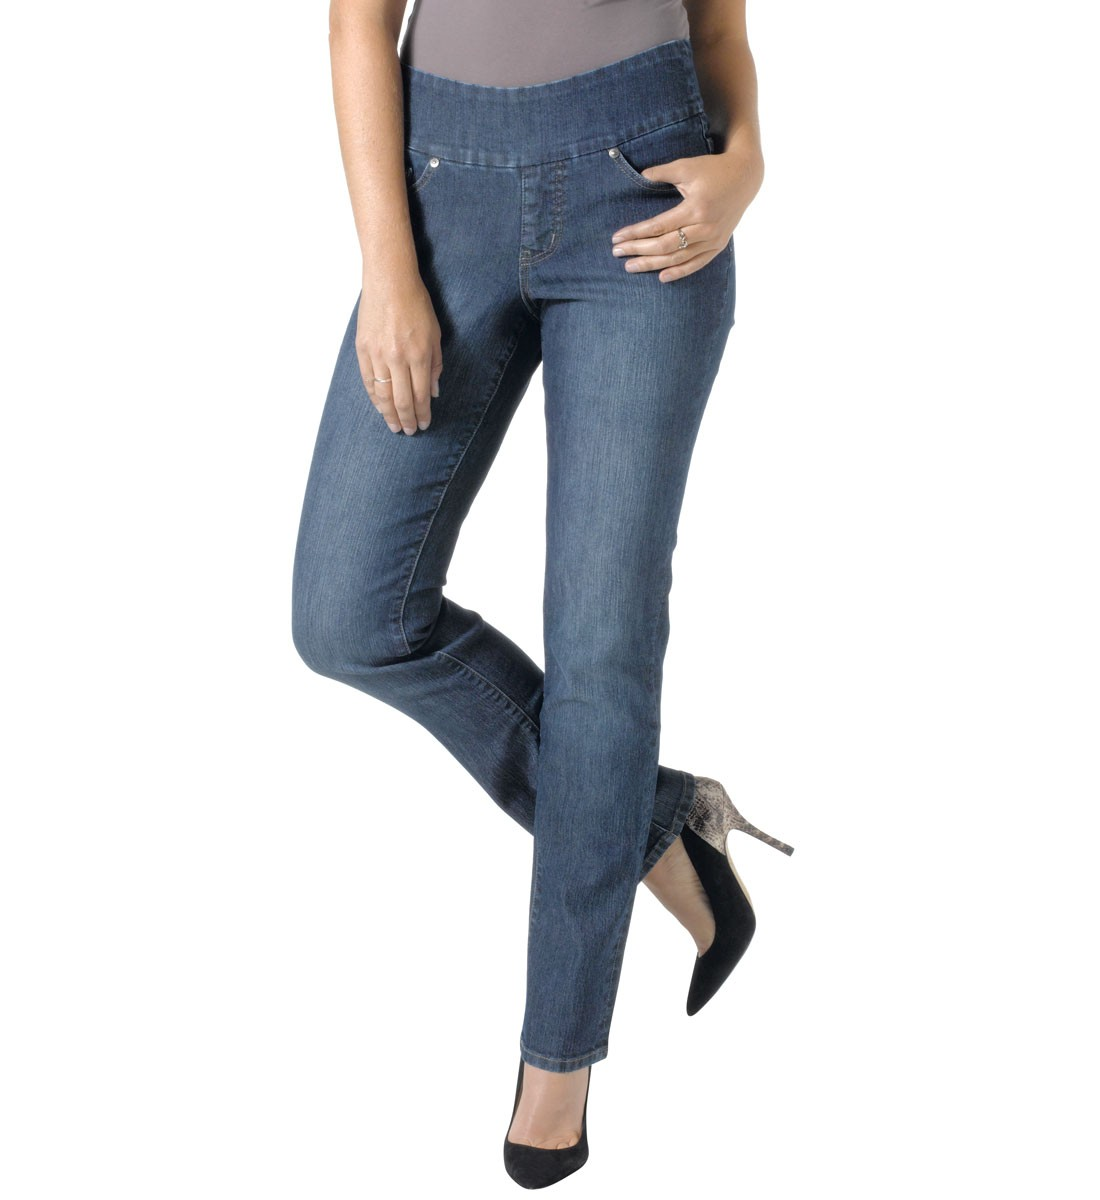 JAG straight leg jeans